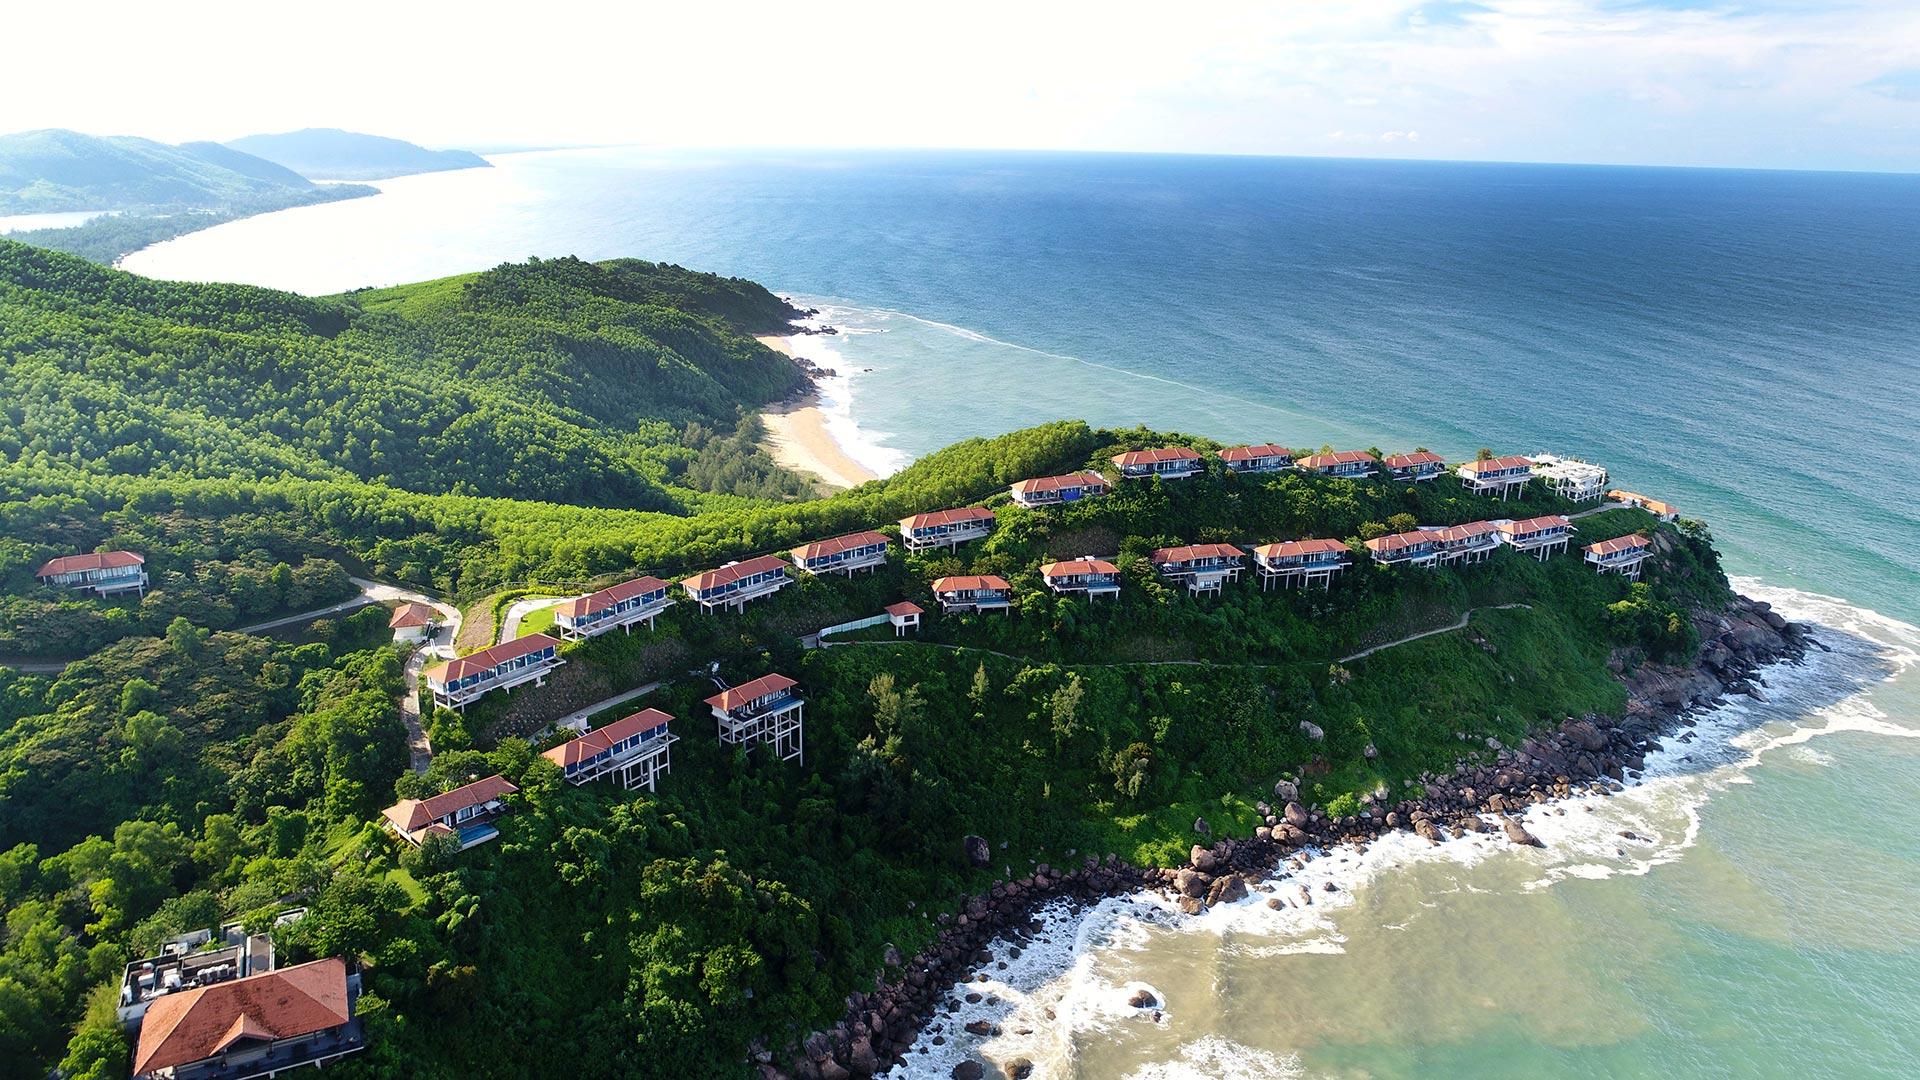 Banyan Tree Lăng Cô Hill Villas - 'The 50 best resorts in the world 2017'